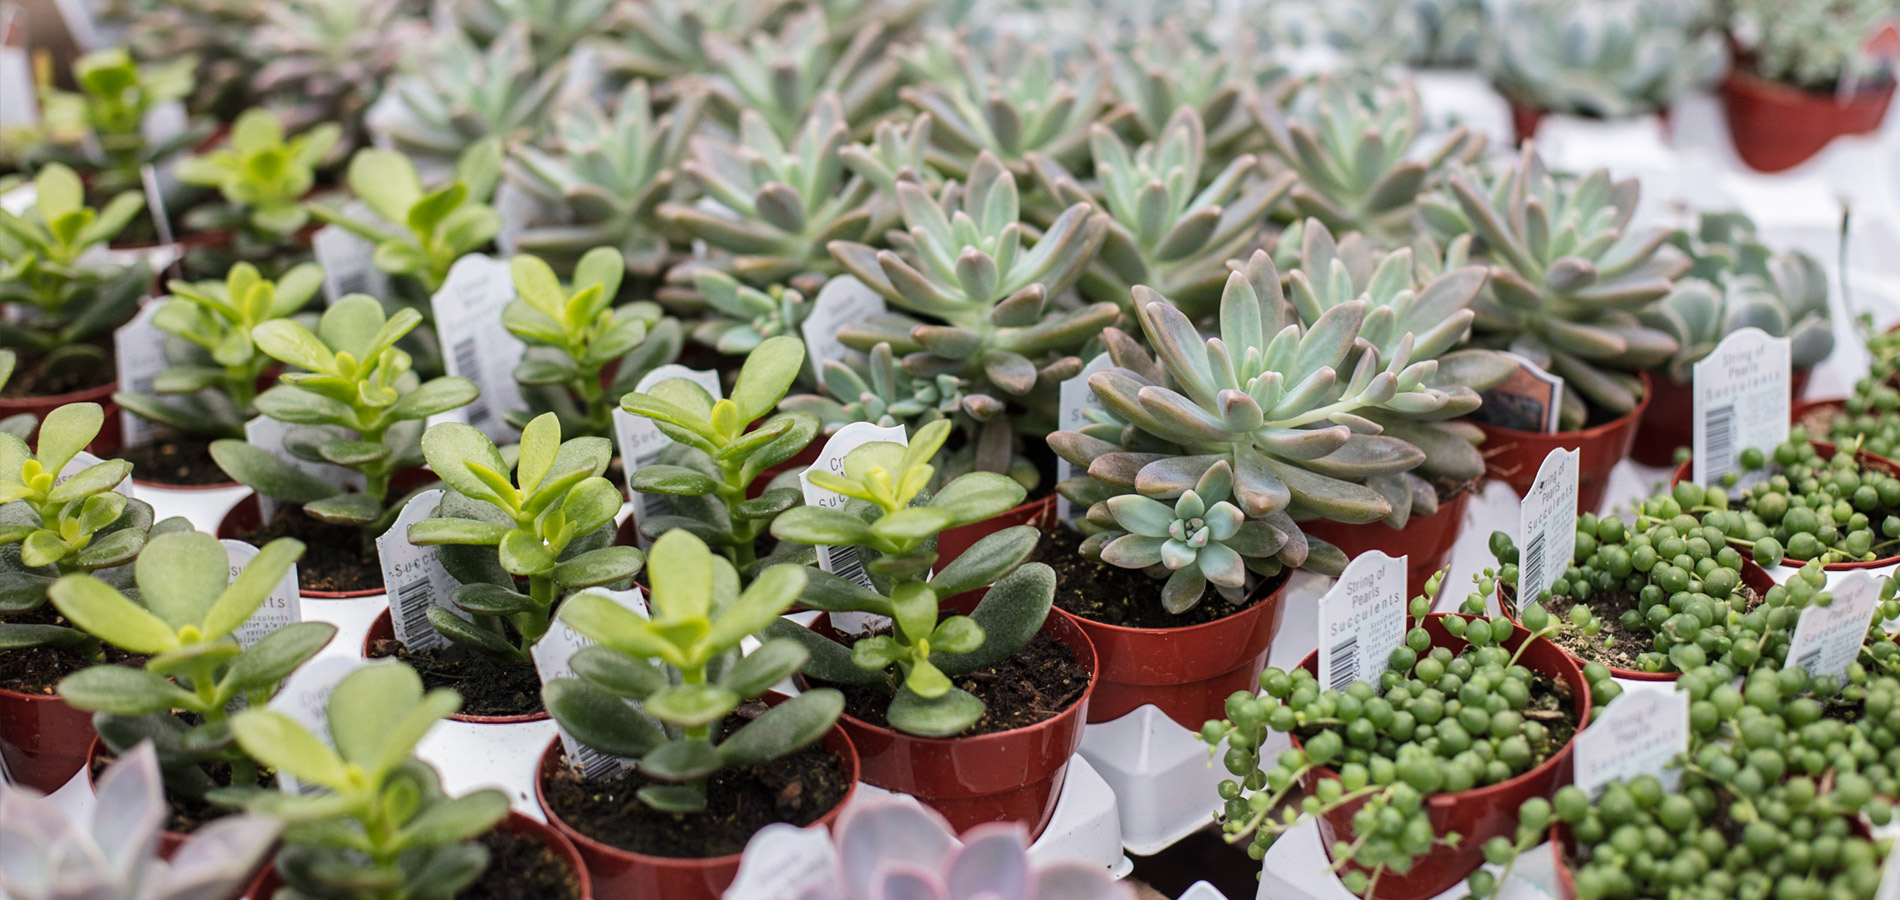 robben florist garden center flowers gardening. Black Bedroom Furniture Sets. Home Design Ideas